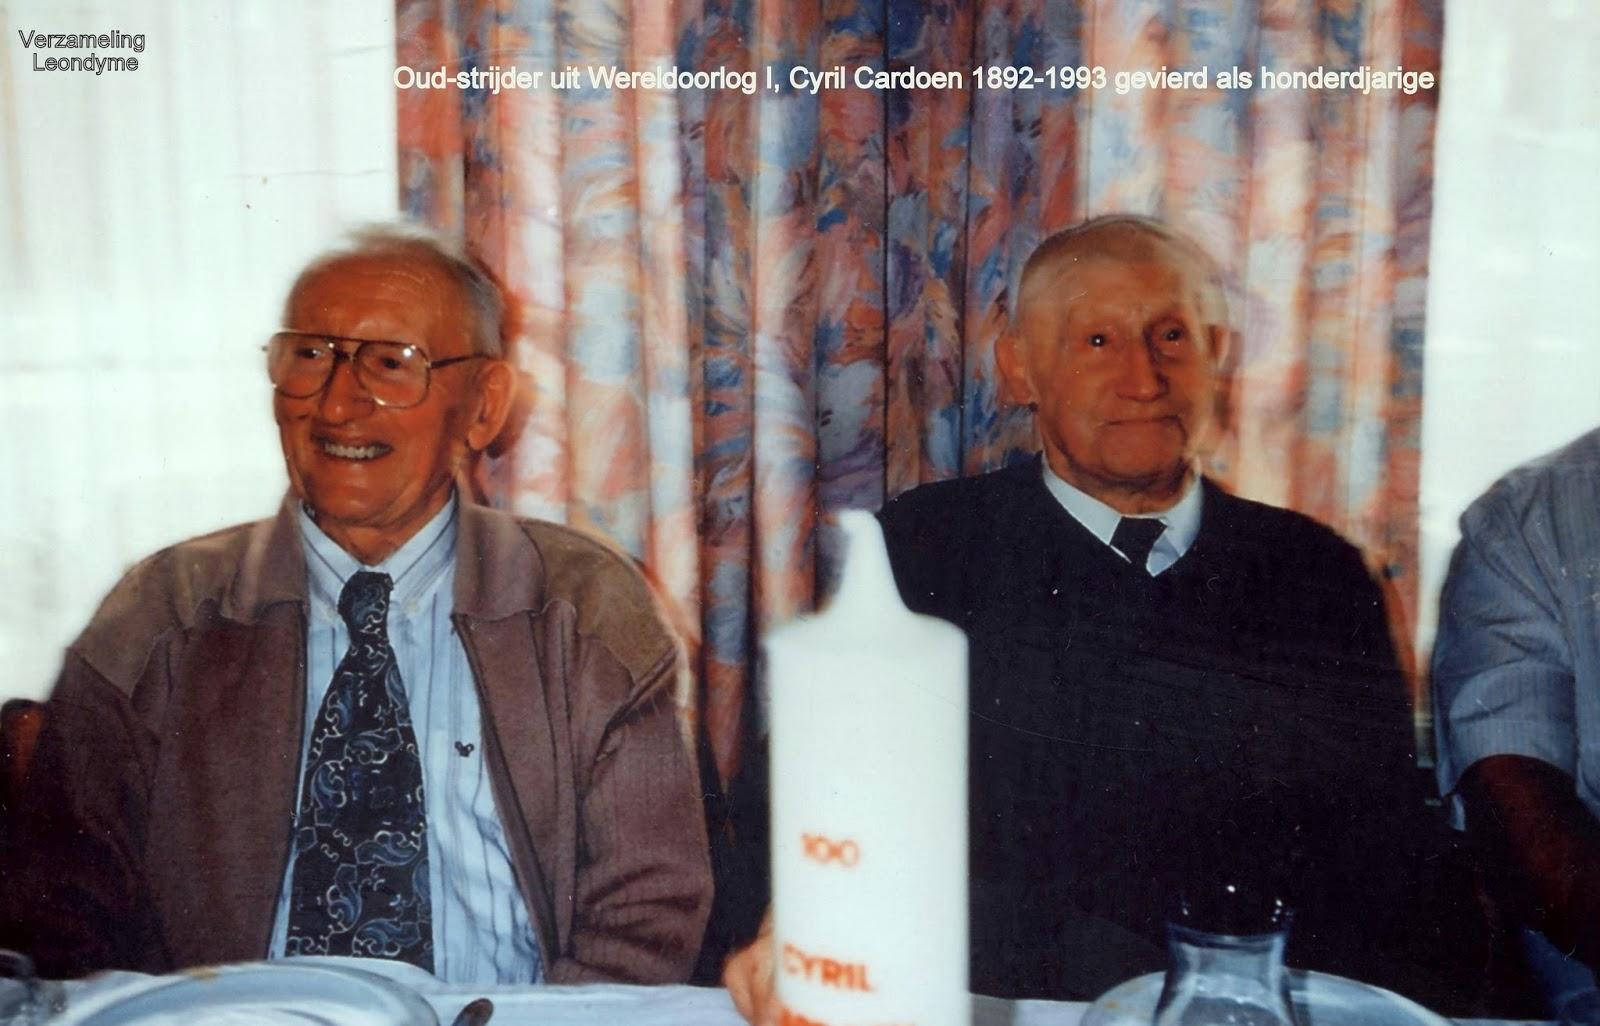 De honderdjarige Cyril Cardoen 1892-1993. Verzameling Leondyme